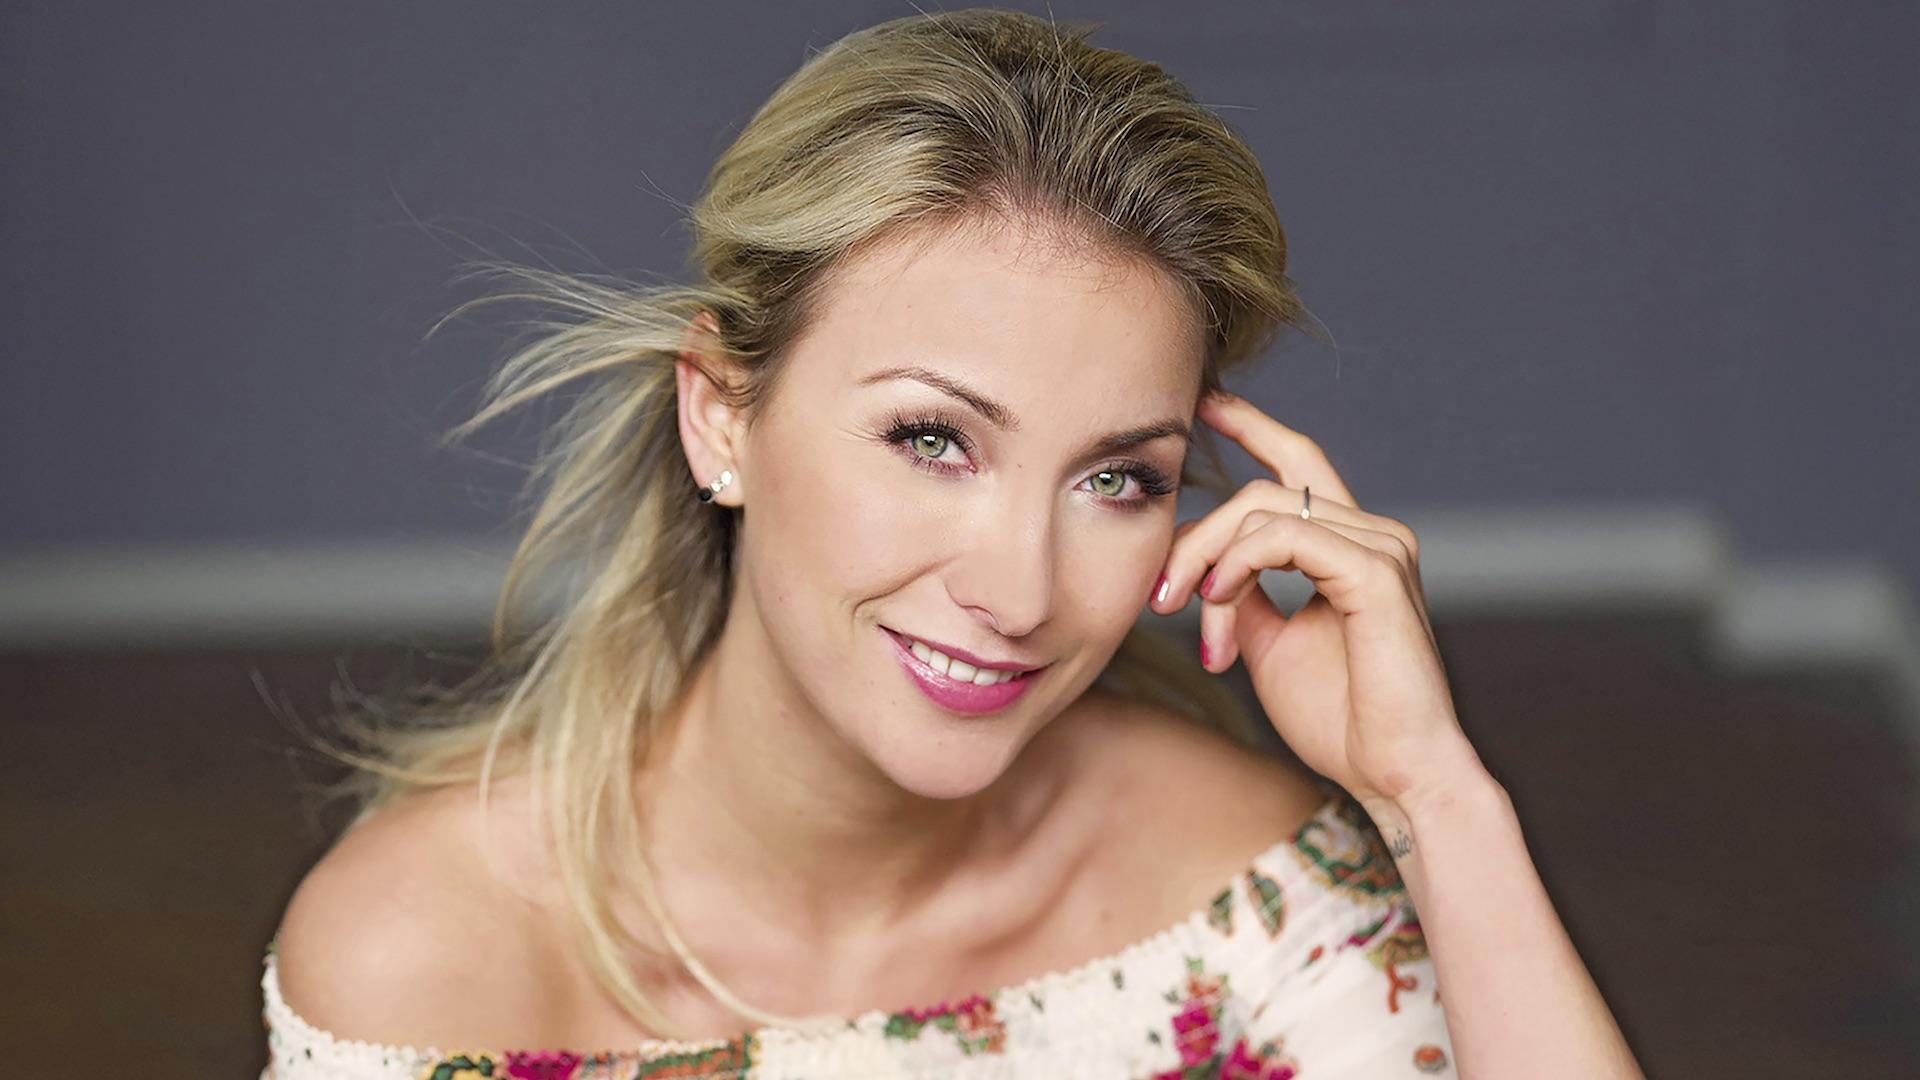 Anna-Carina Woitschack wird beim Schlosspark Schlager singen.